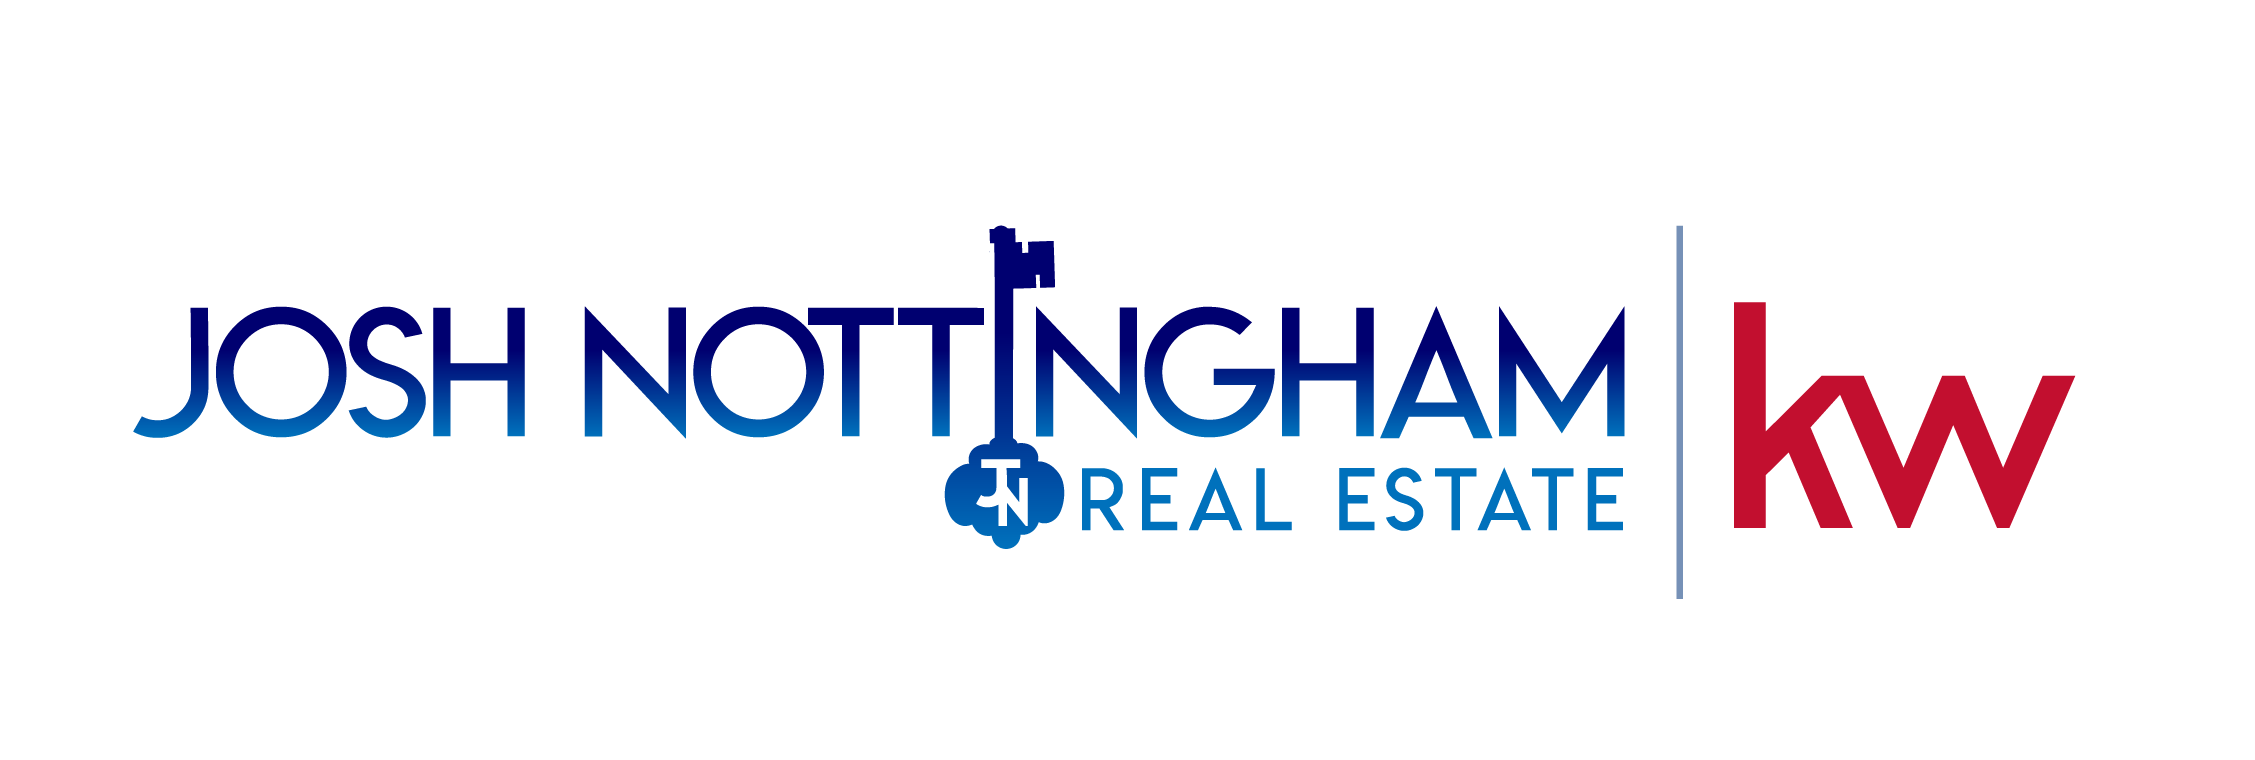 San Diego Real Estate | Josh Nottingham